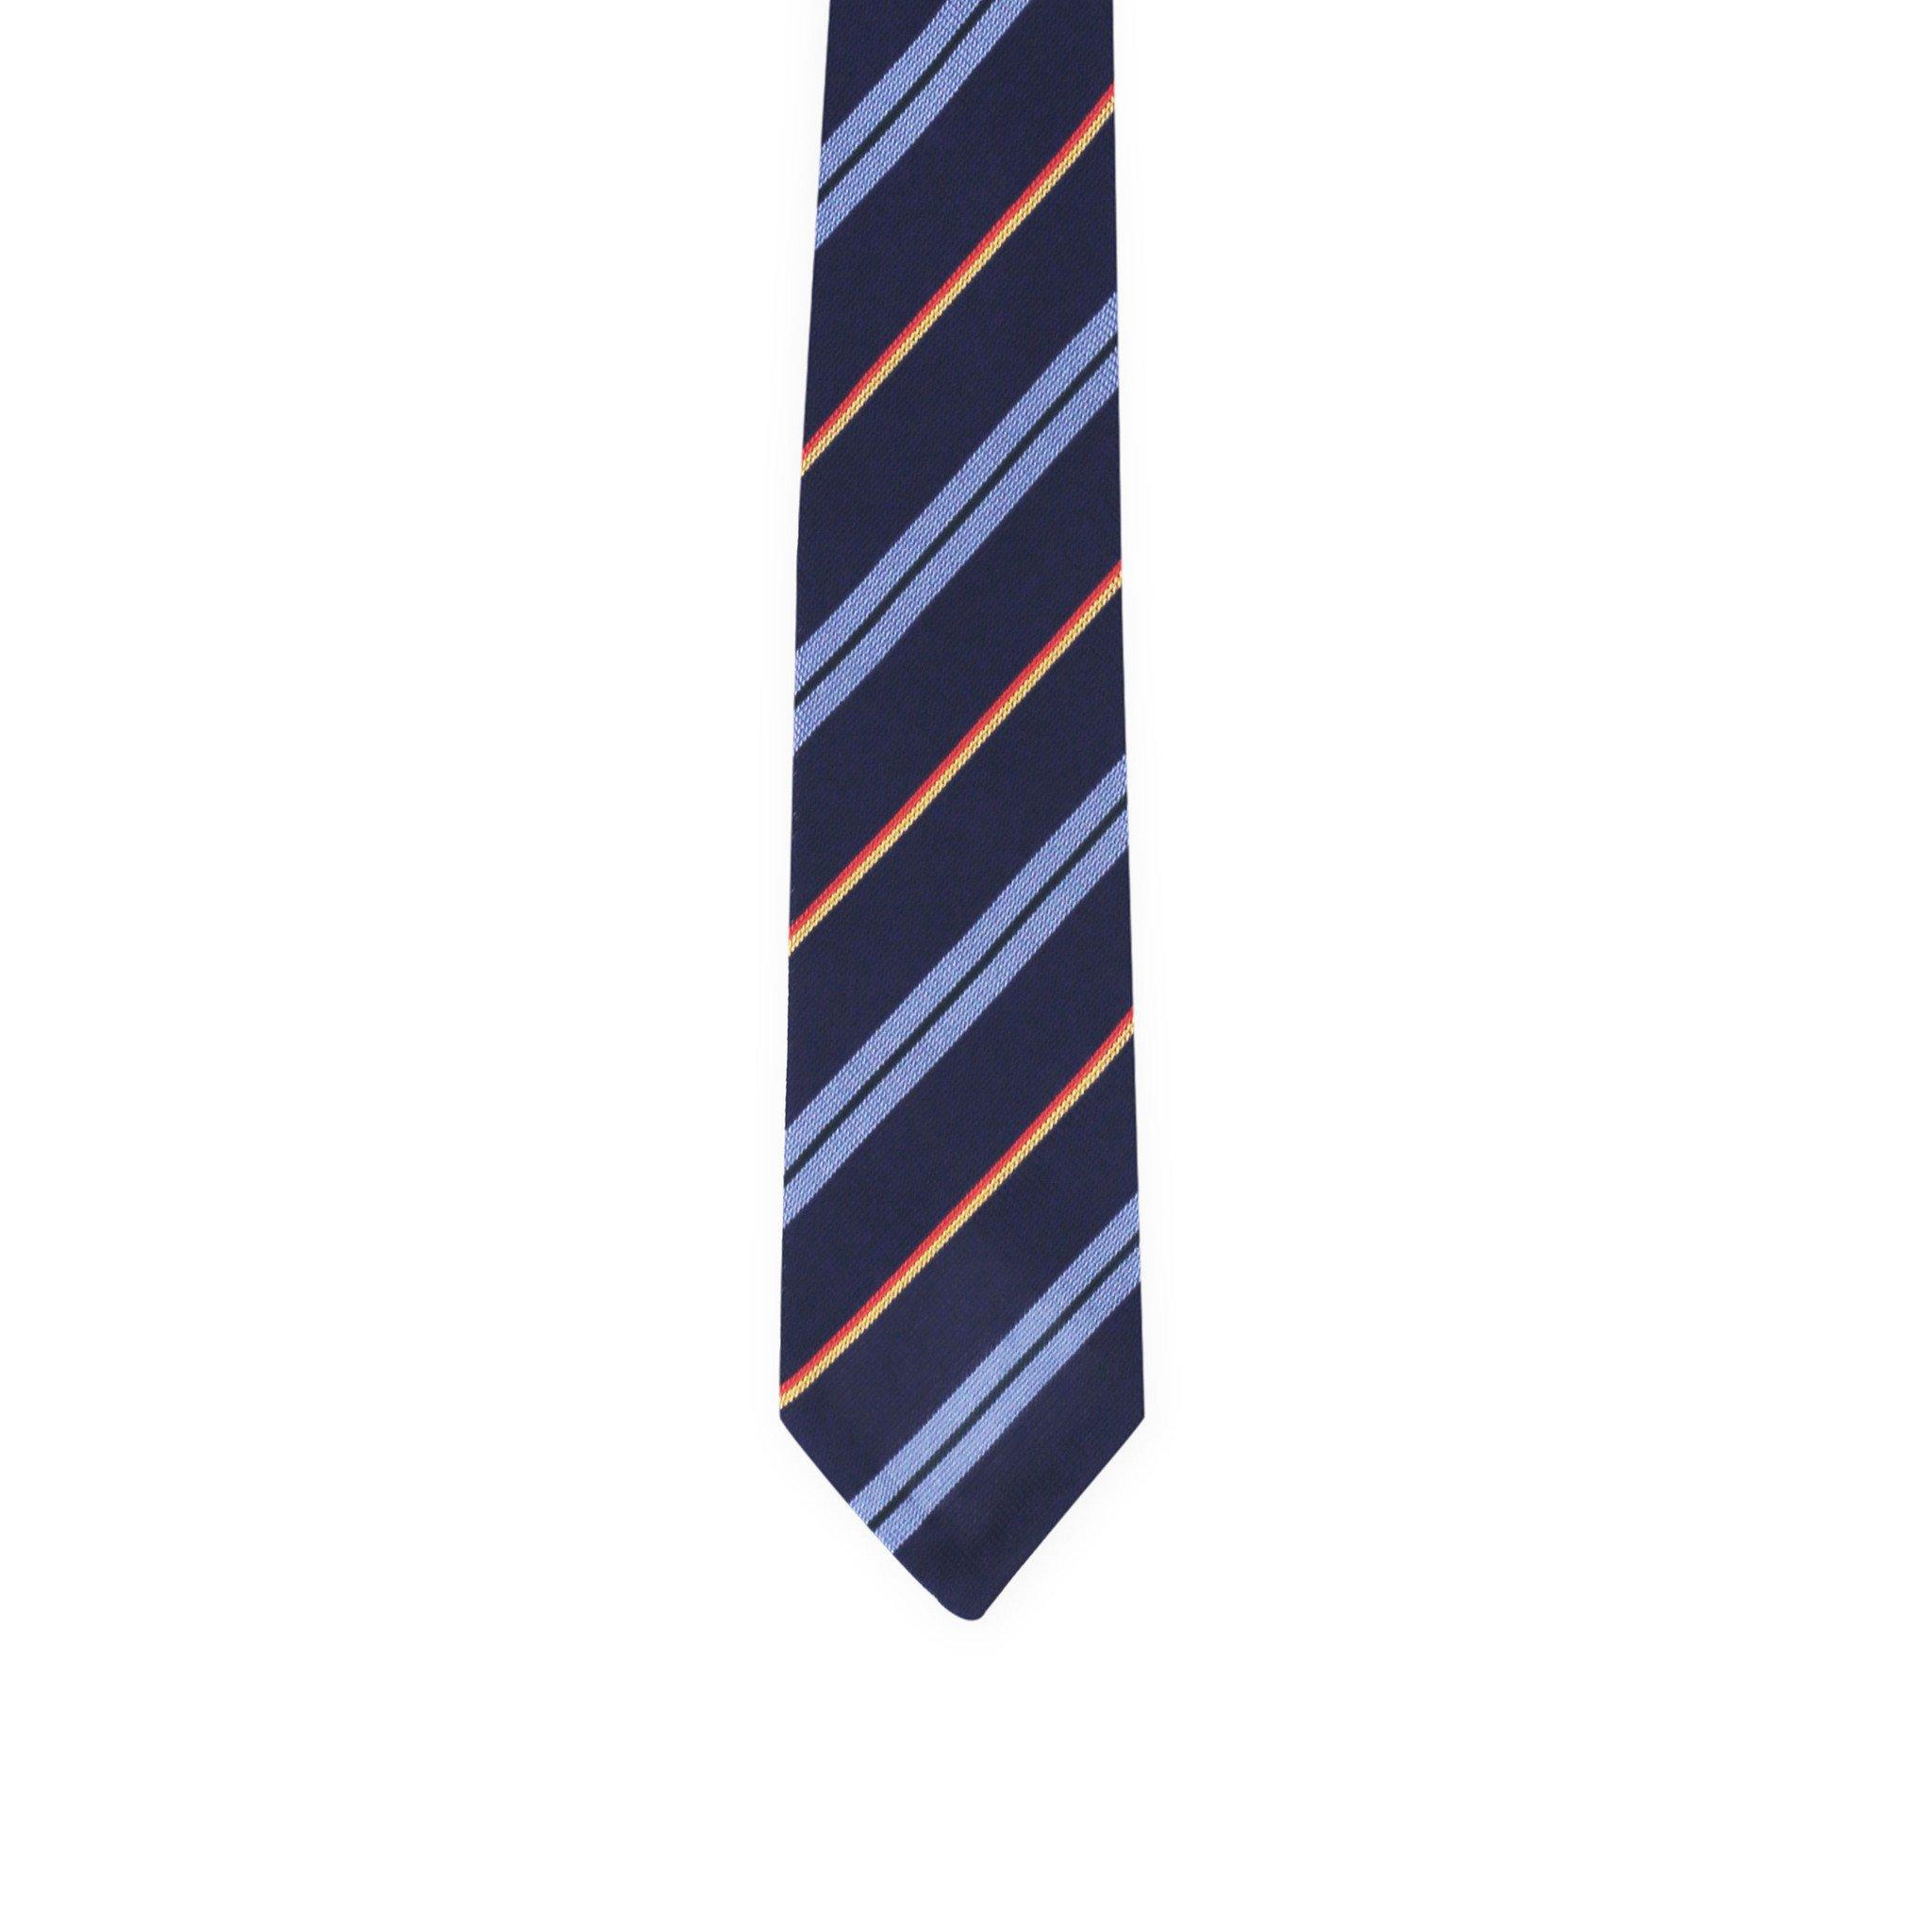 Diagonal regimental tie - navy